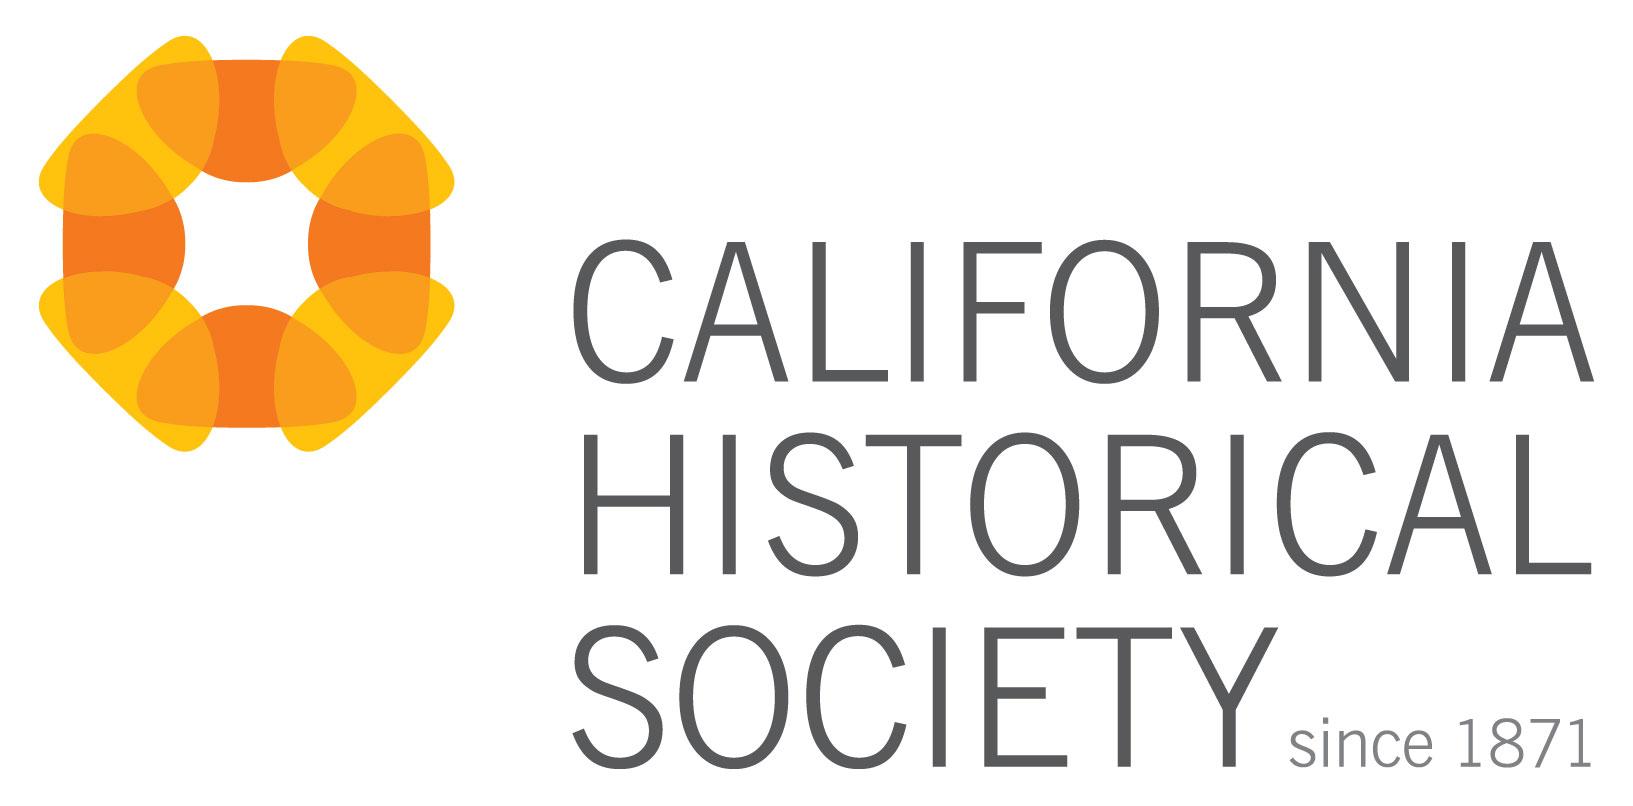 California_Historical_Society_logo.jpg